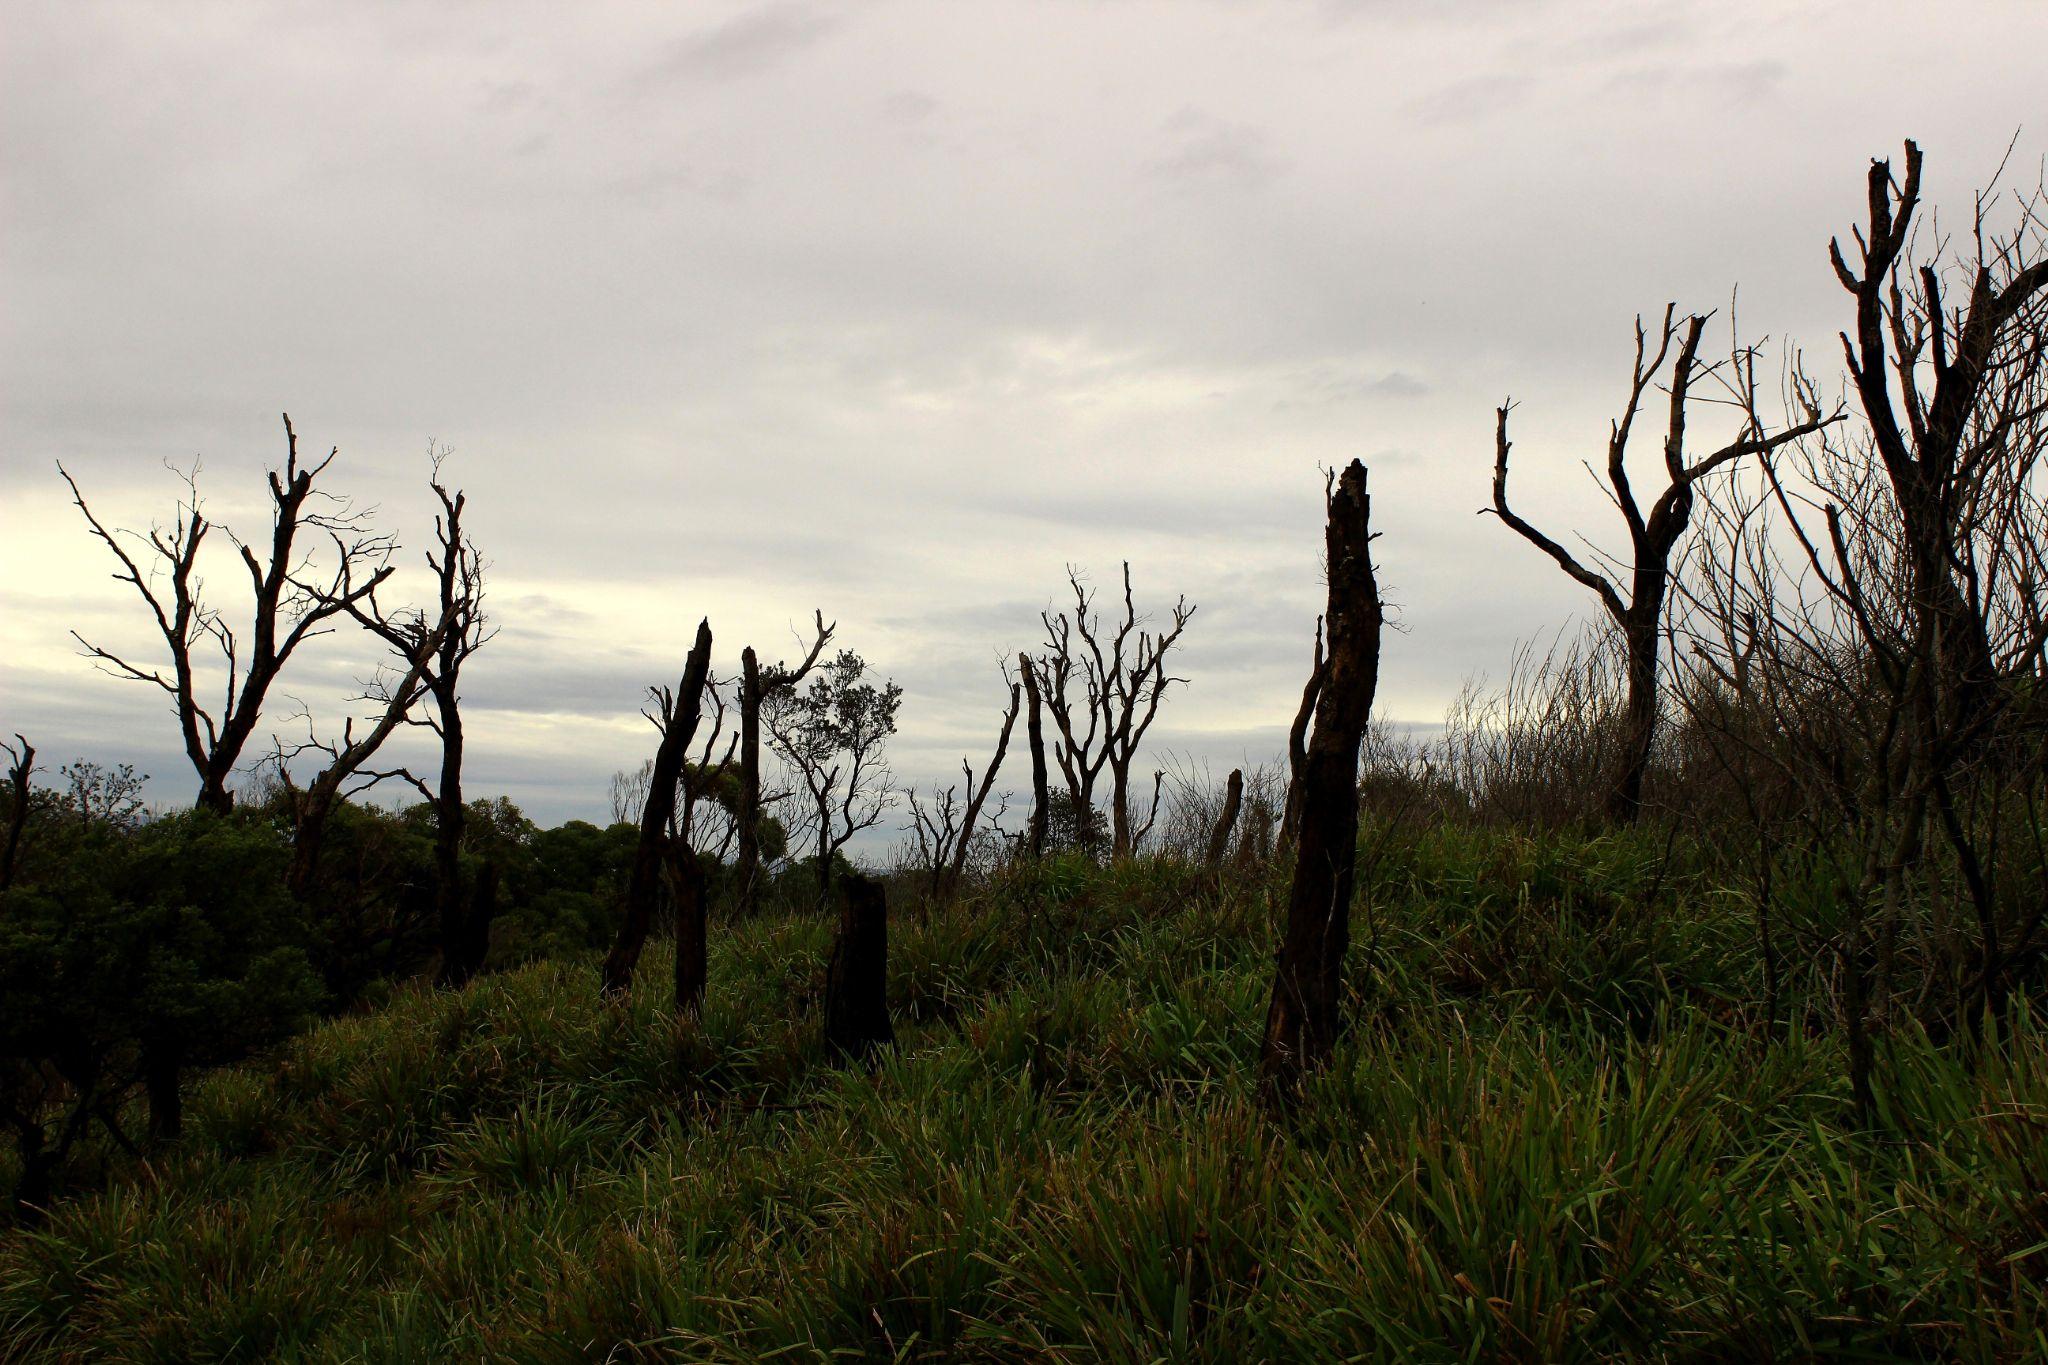 Desolation by Isabel Sottomayor